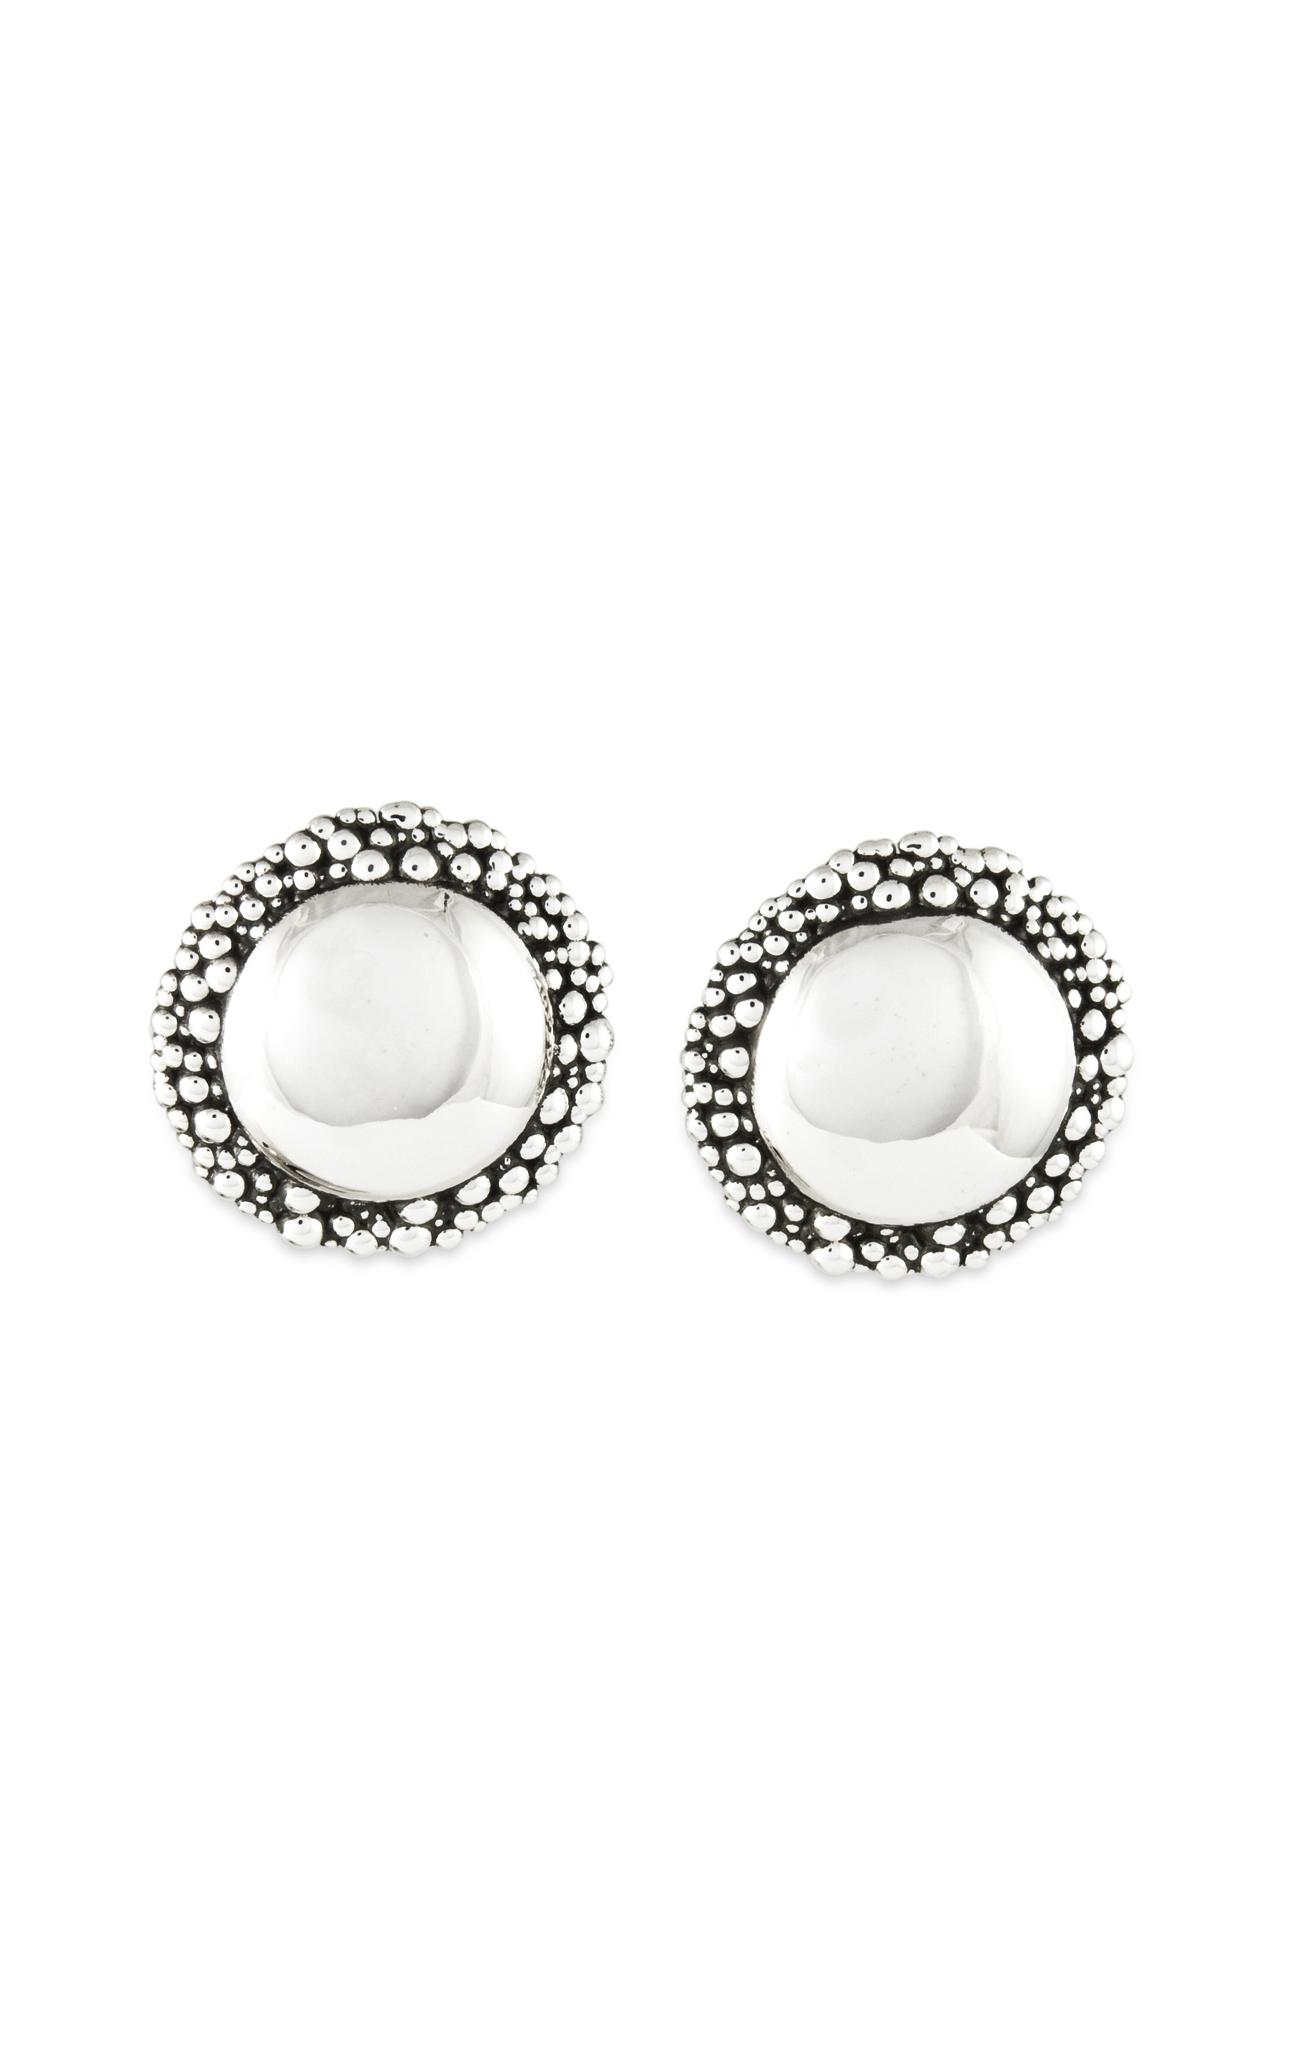 Zina Rain Earrings B1471 product image